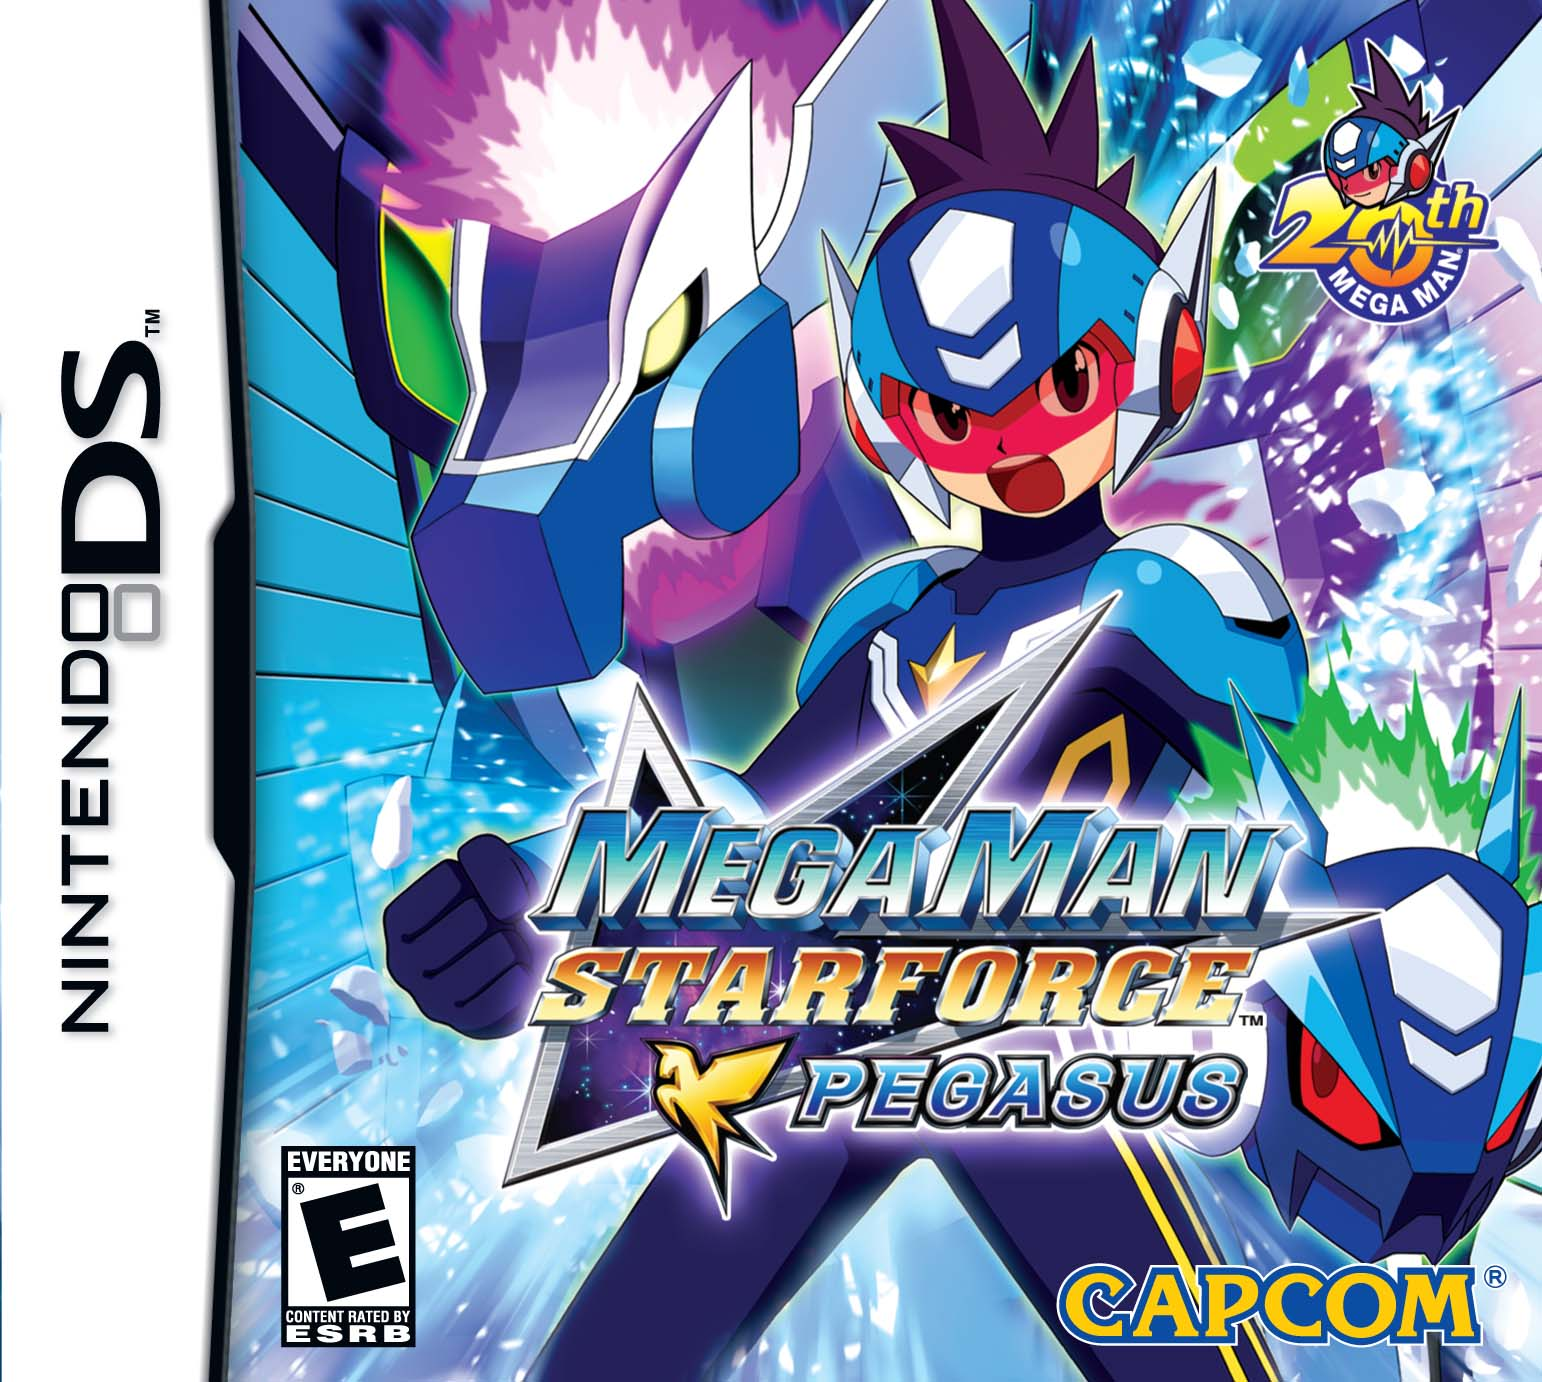 Mega Man Star Force (video game)   MMKB   FANDOM powered by